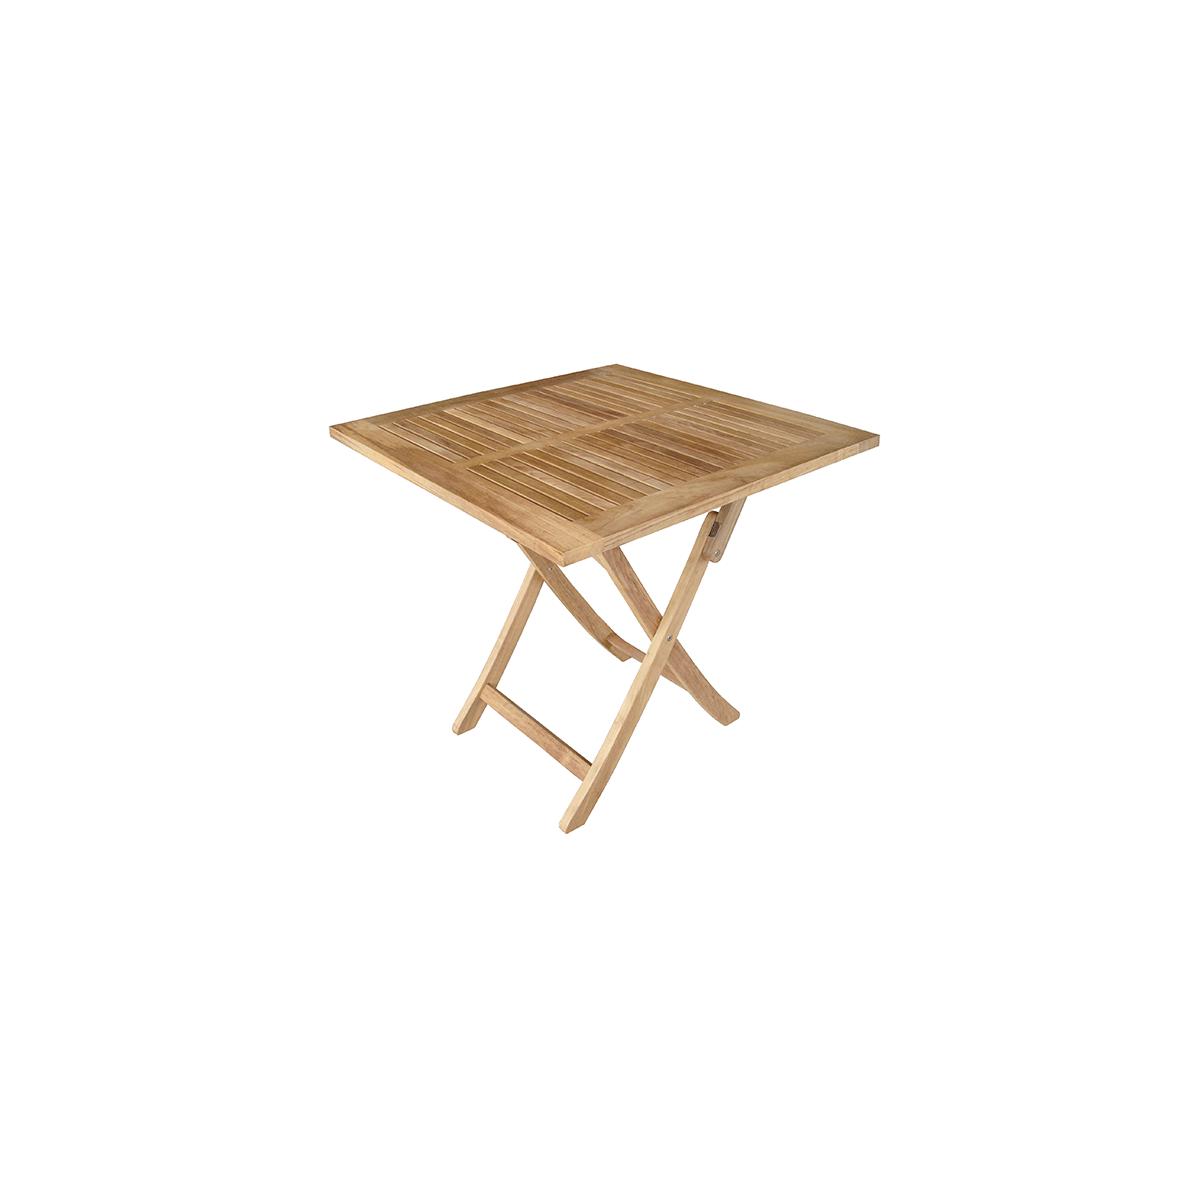 Gartenm bel coop schweiz kollektion ideen garten design for Sessel quadratisch